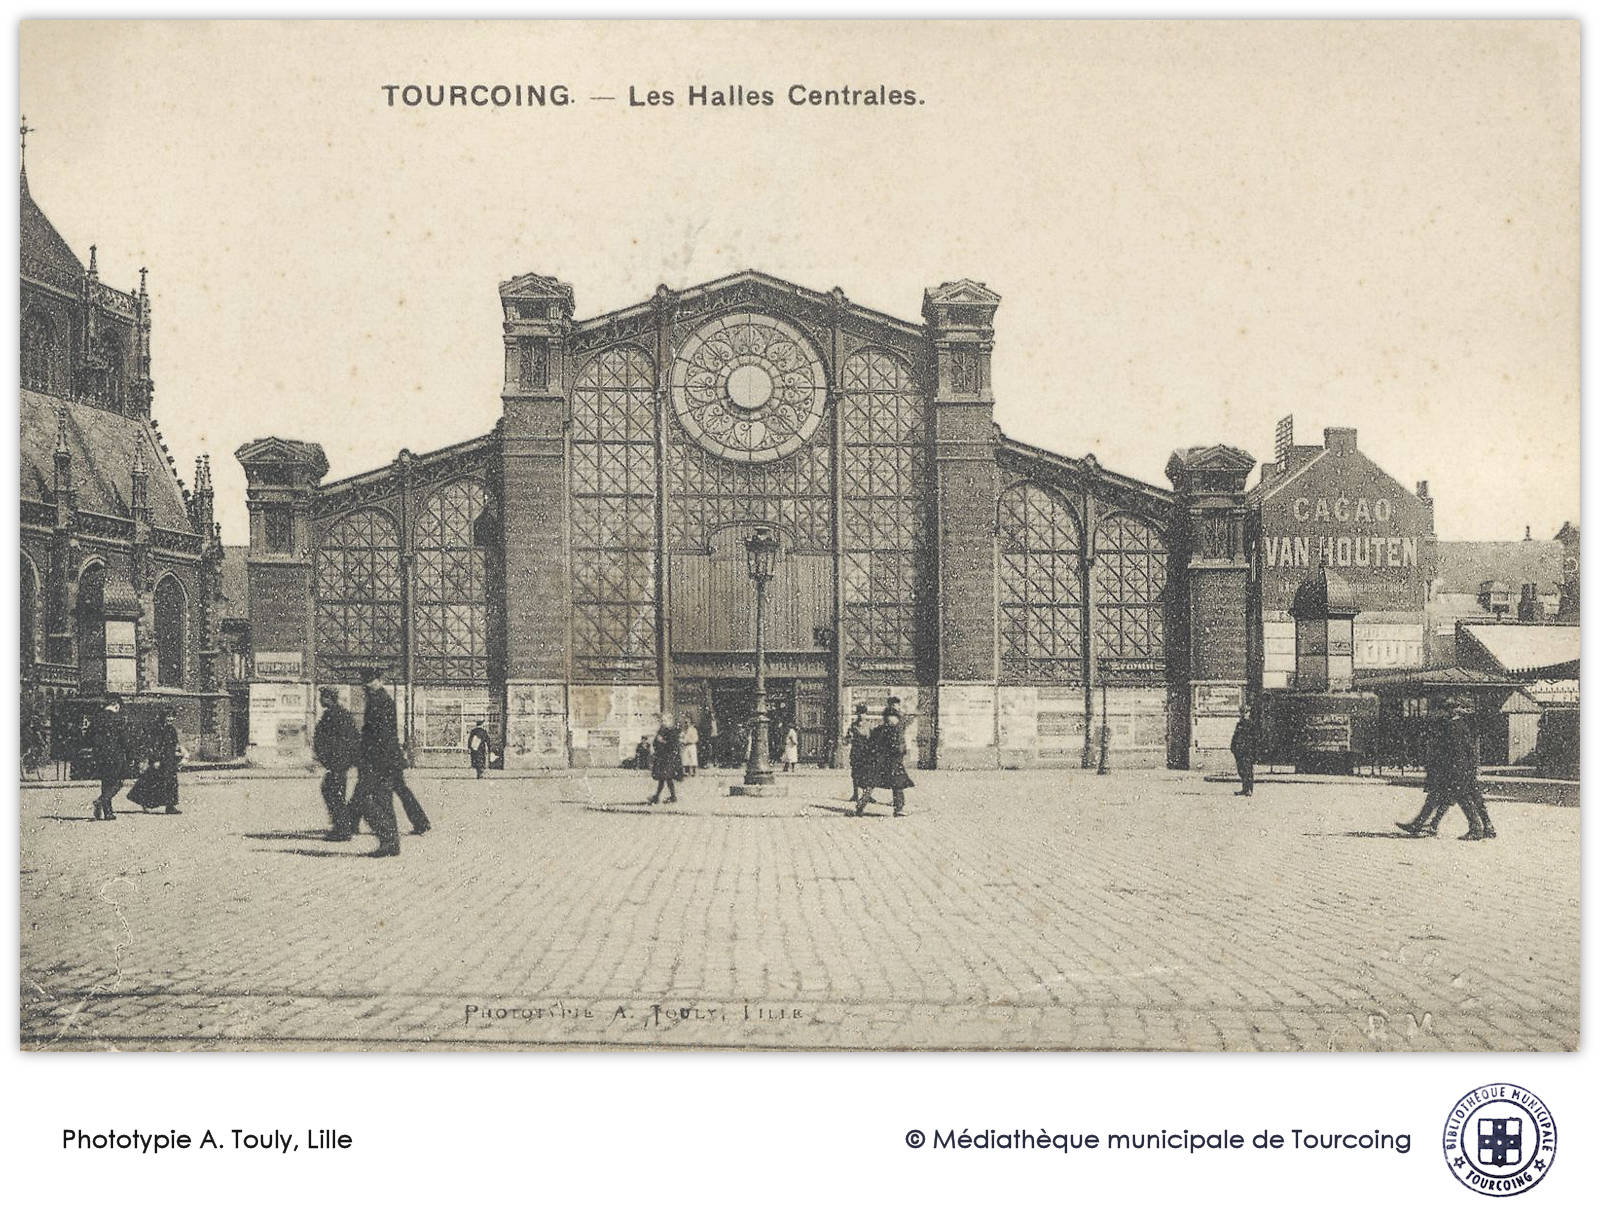 Phototypie Touly, Tourcoing Halles